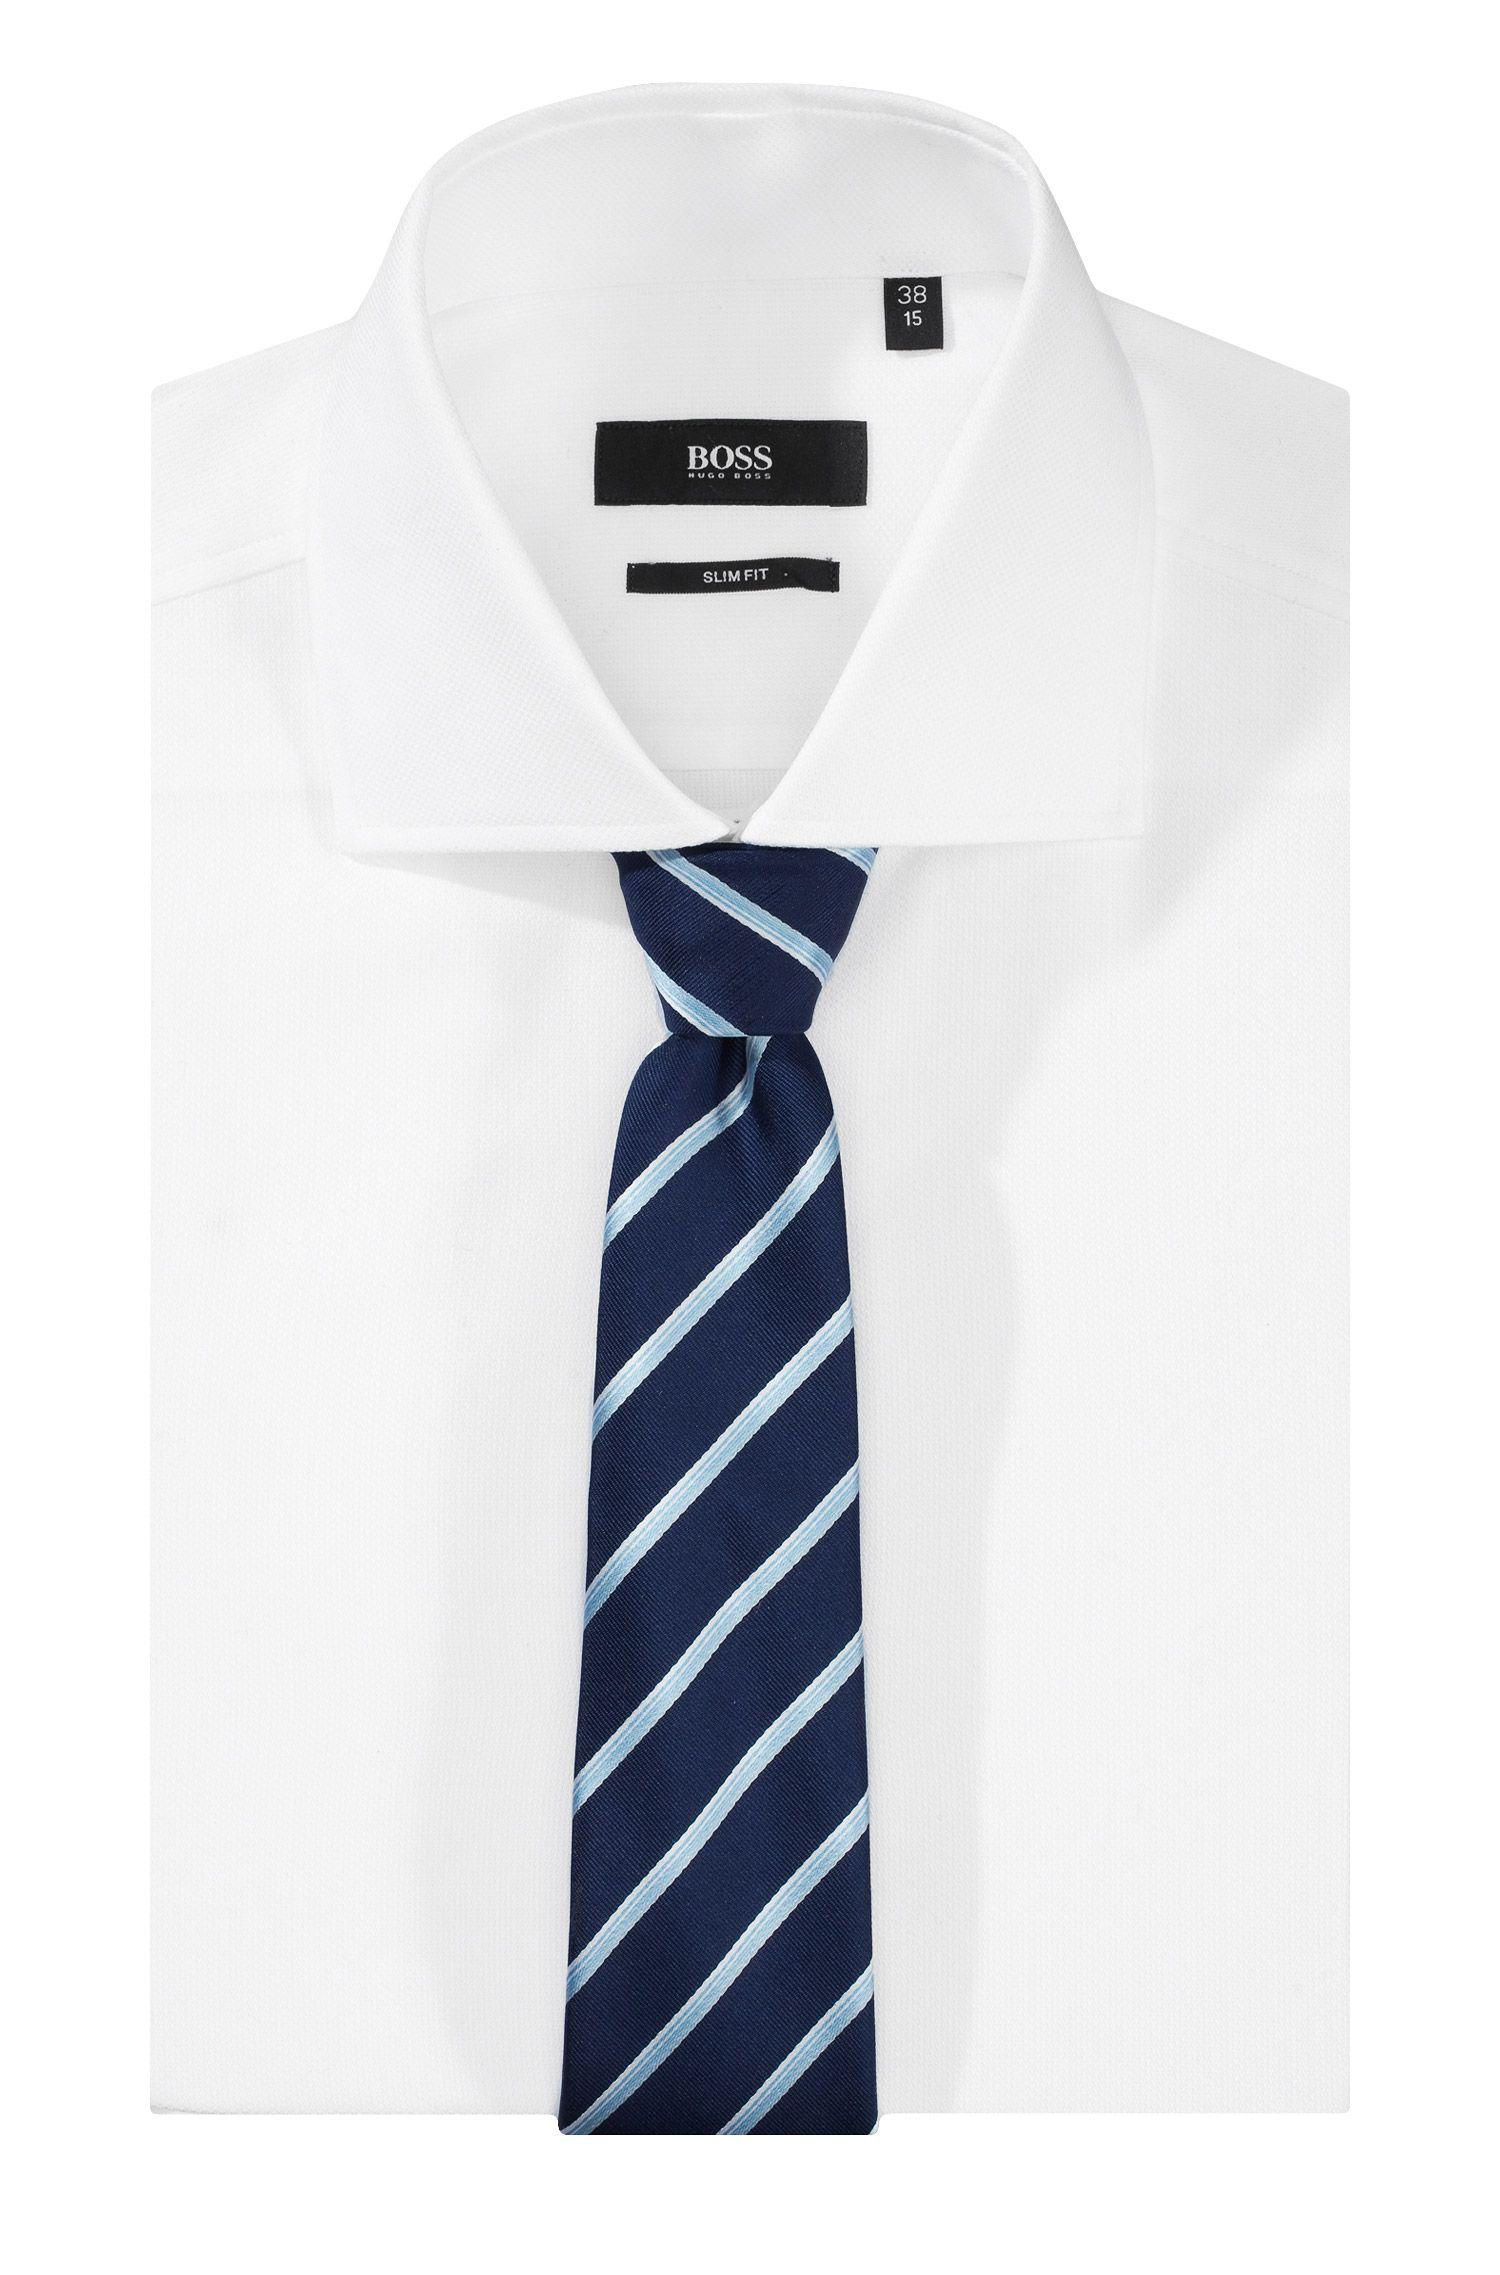 Cravate en pure soie, Tie 7,5 cm